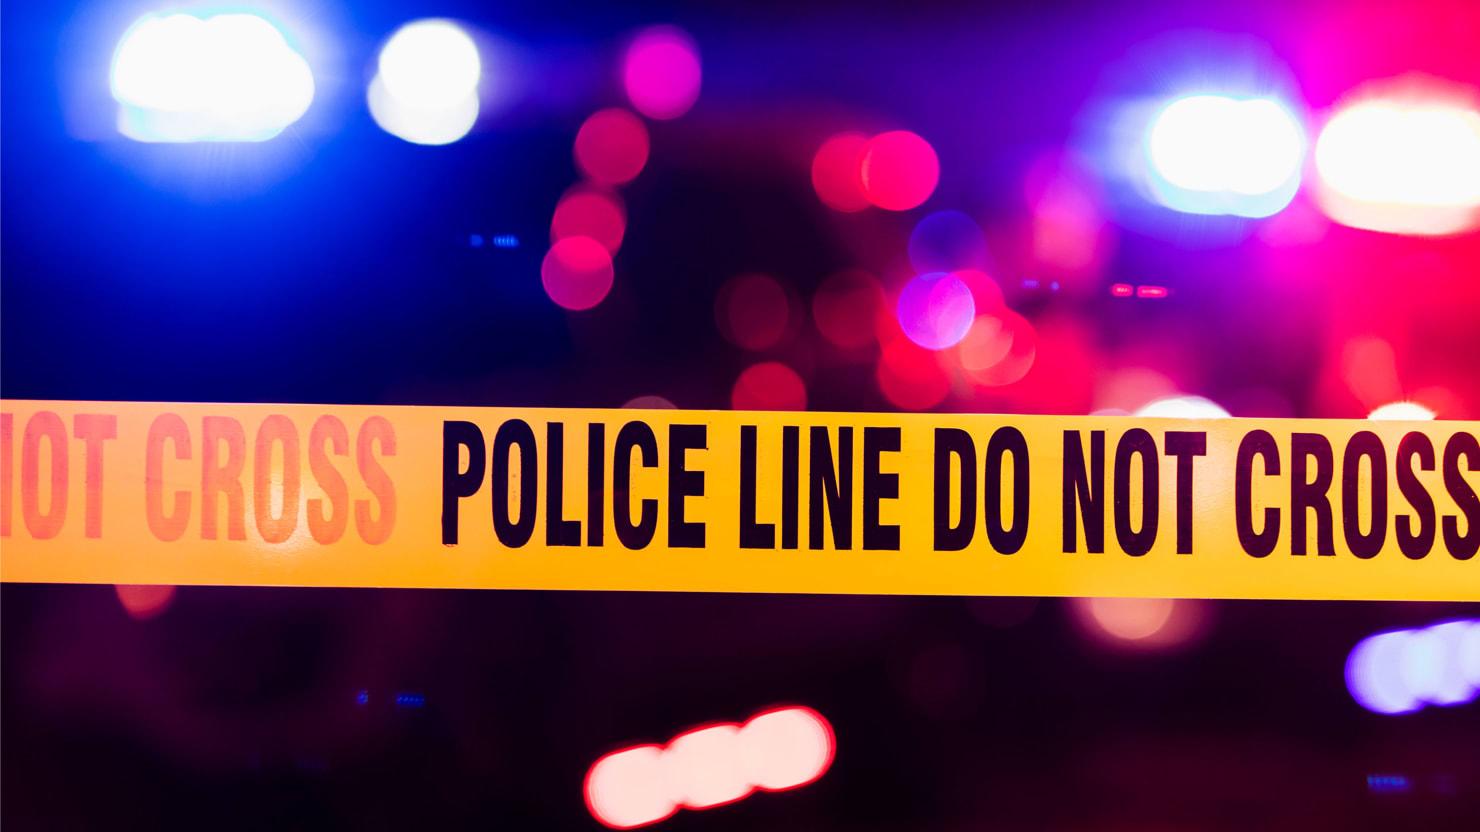 5 Dead, 21 Injured in West Texas Shooting Spree